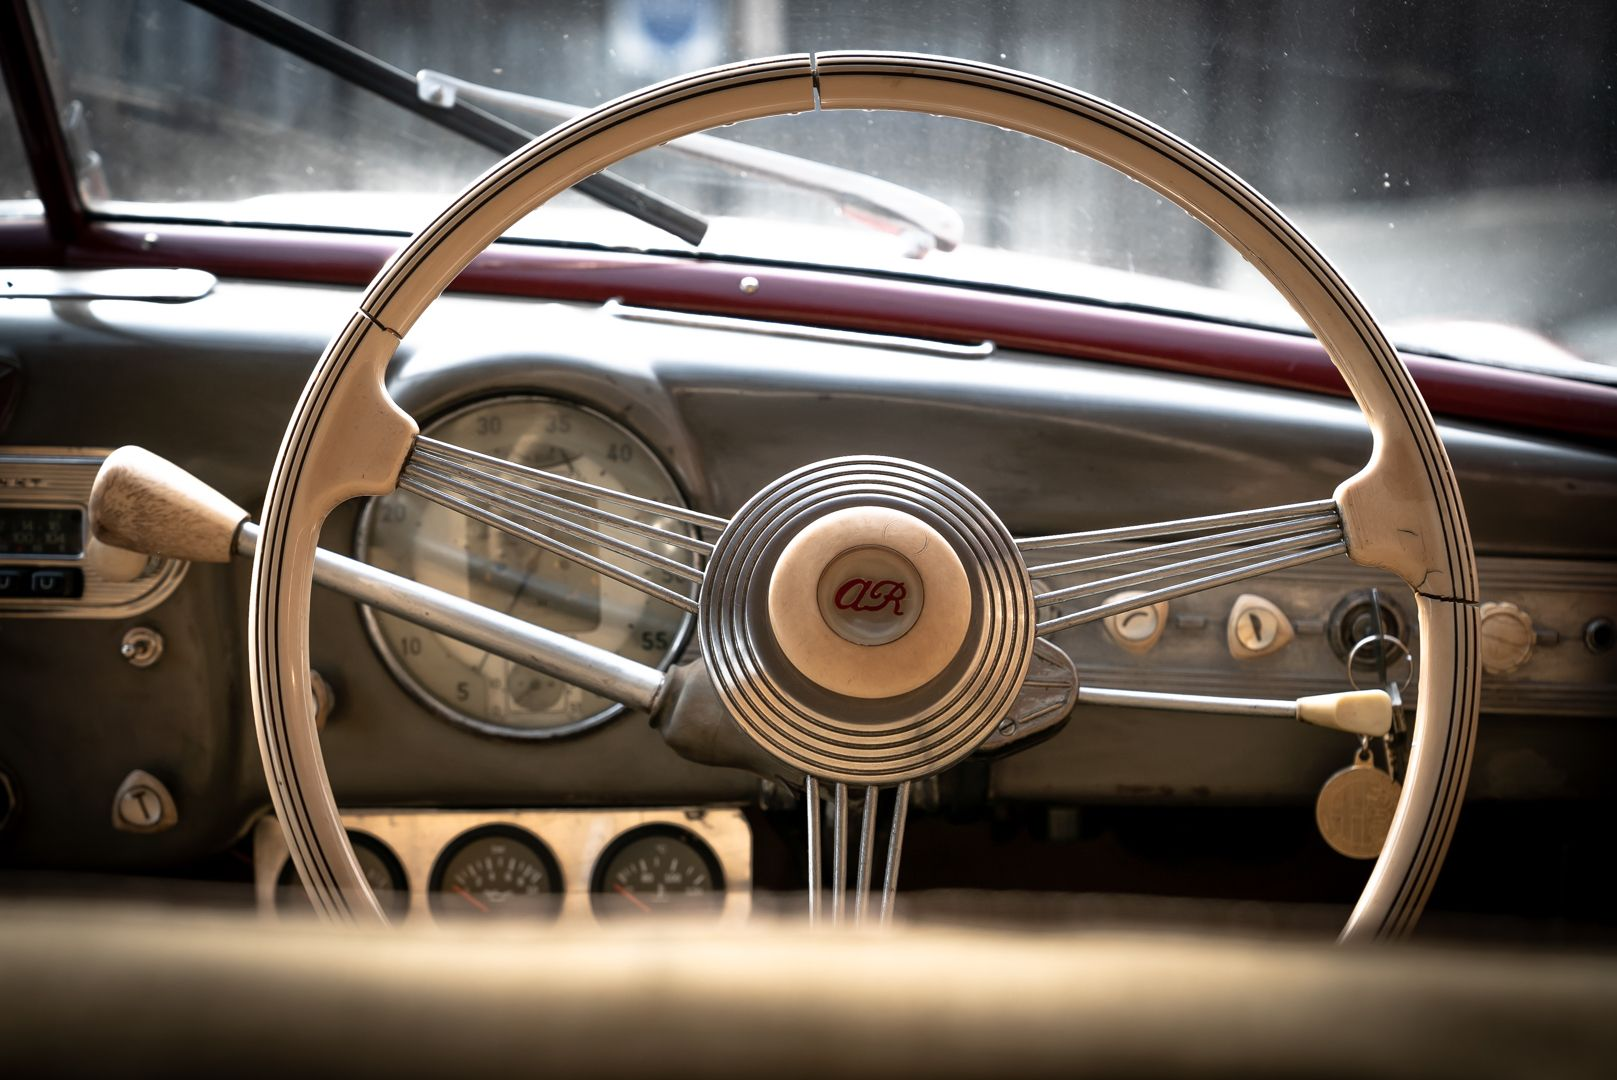 1947 Alfa Romeo Freccia d'oro 6C 2500 Sport 61757